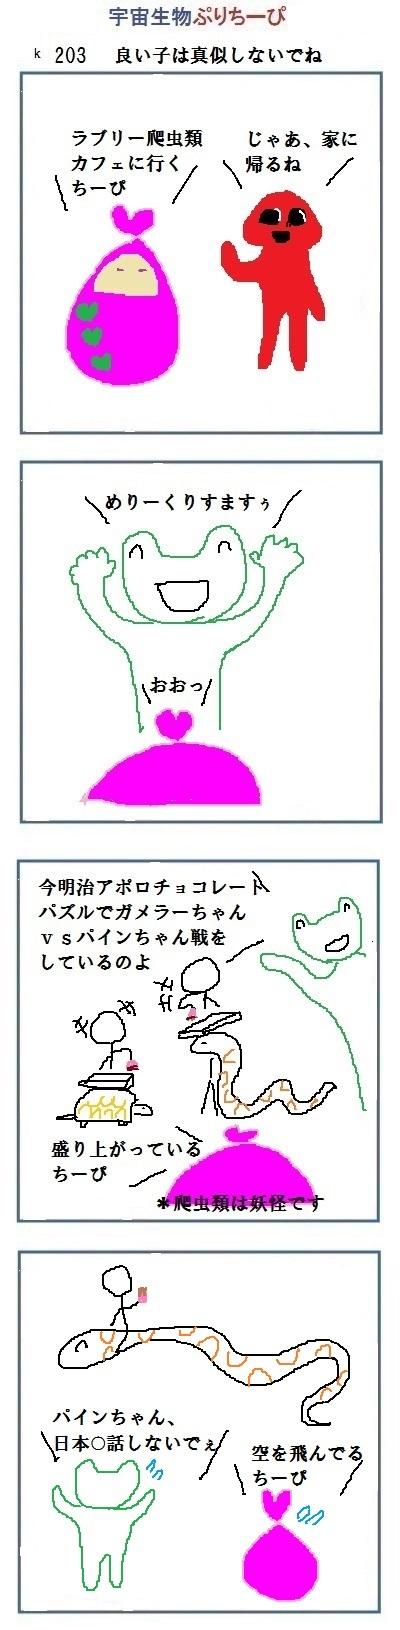 161225_k203_1